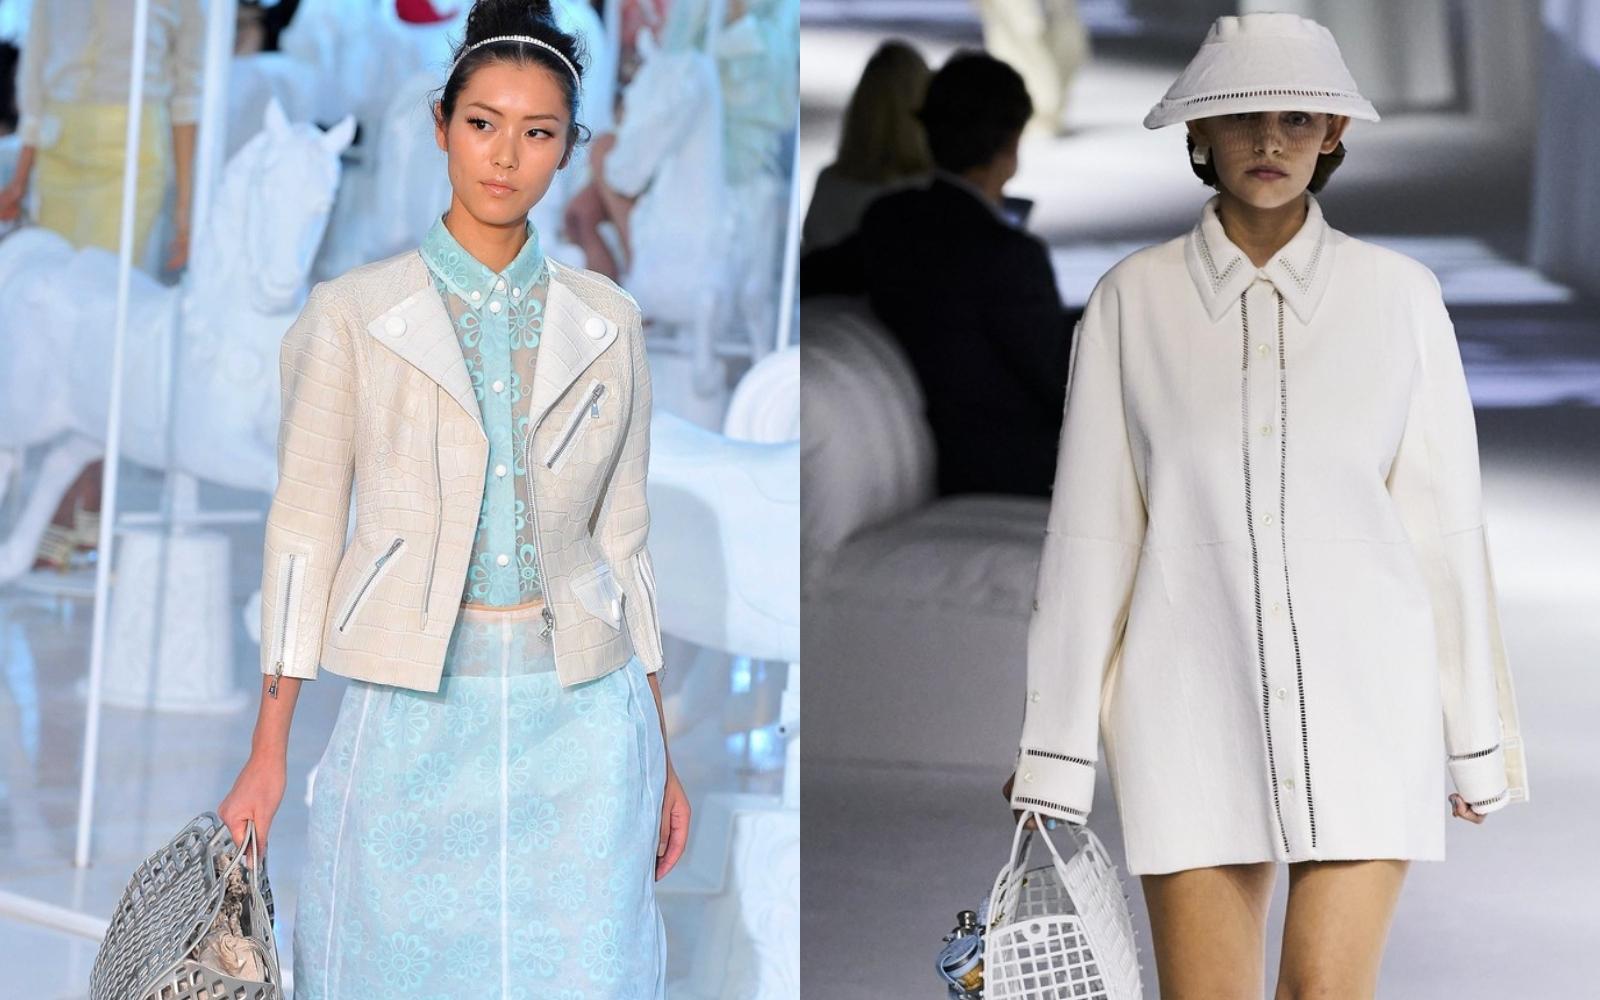 Uups! Louis Vuitton vs. Fendi